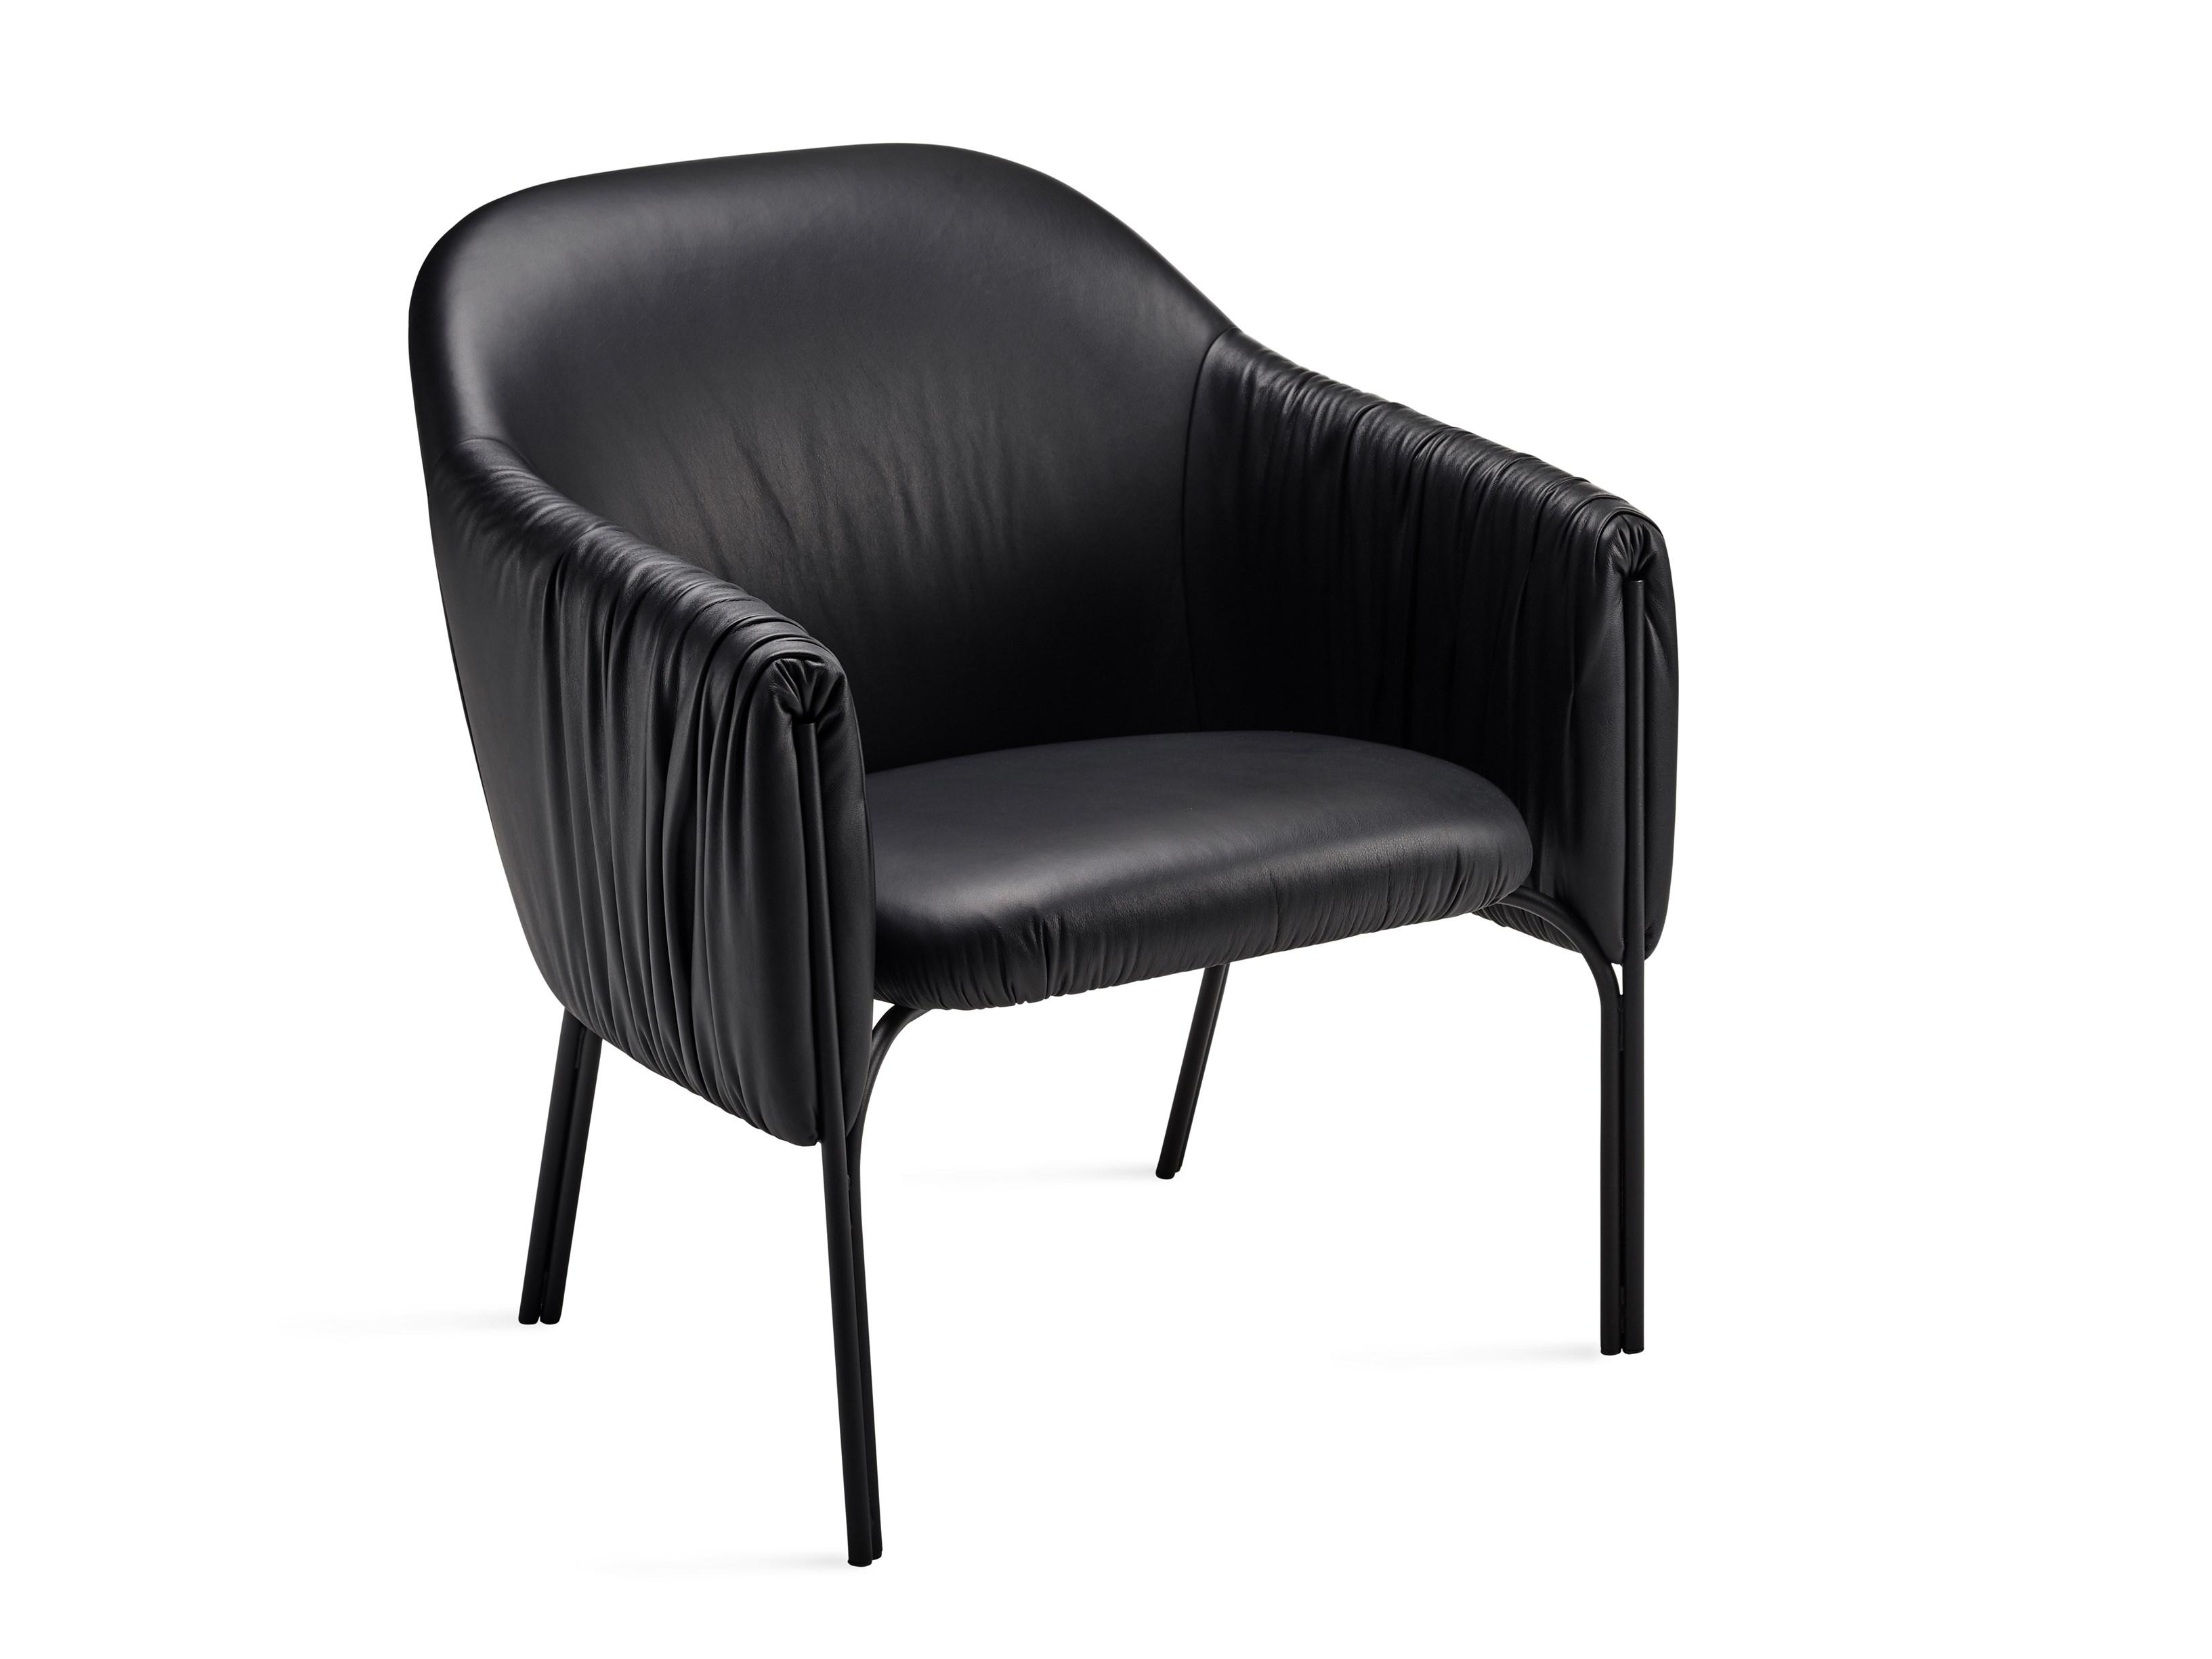 Celine Cocktail Chair by Lucie Koldova